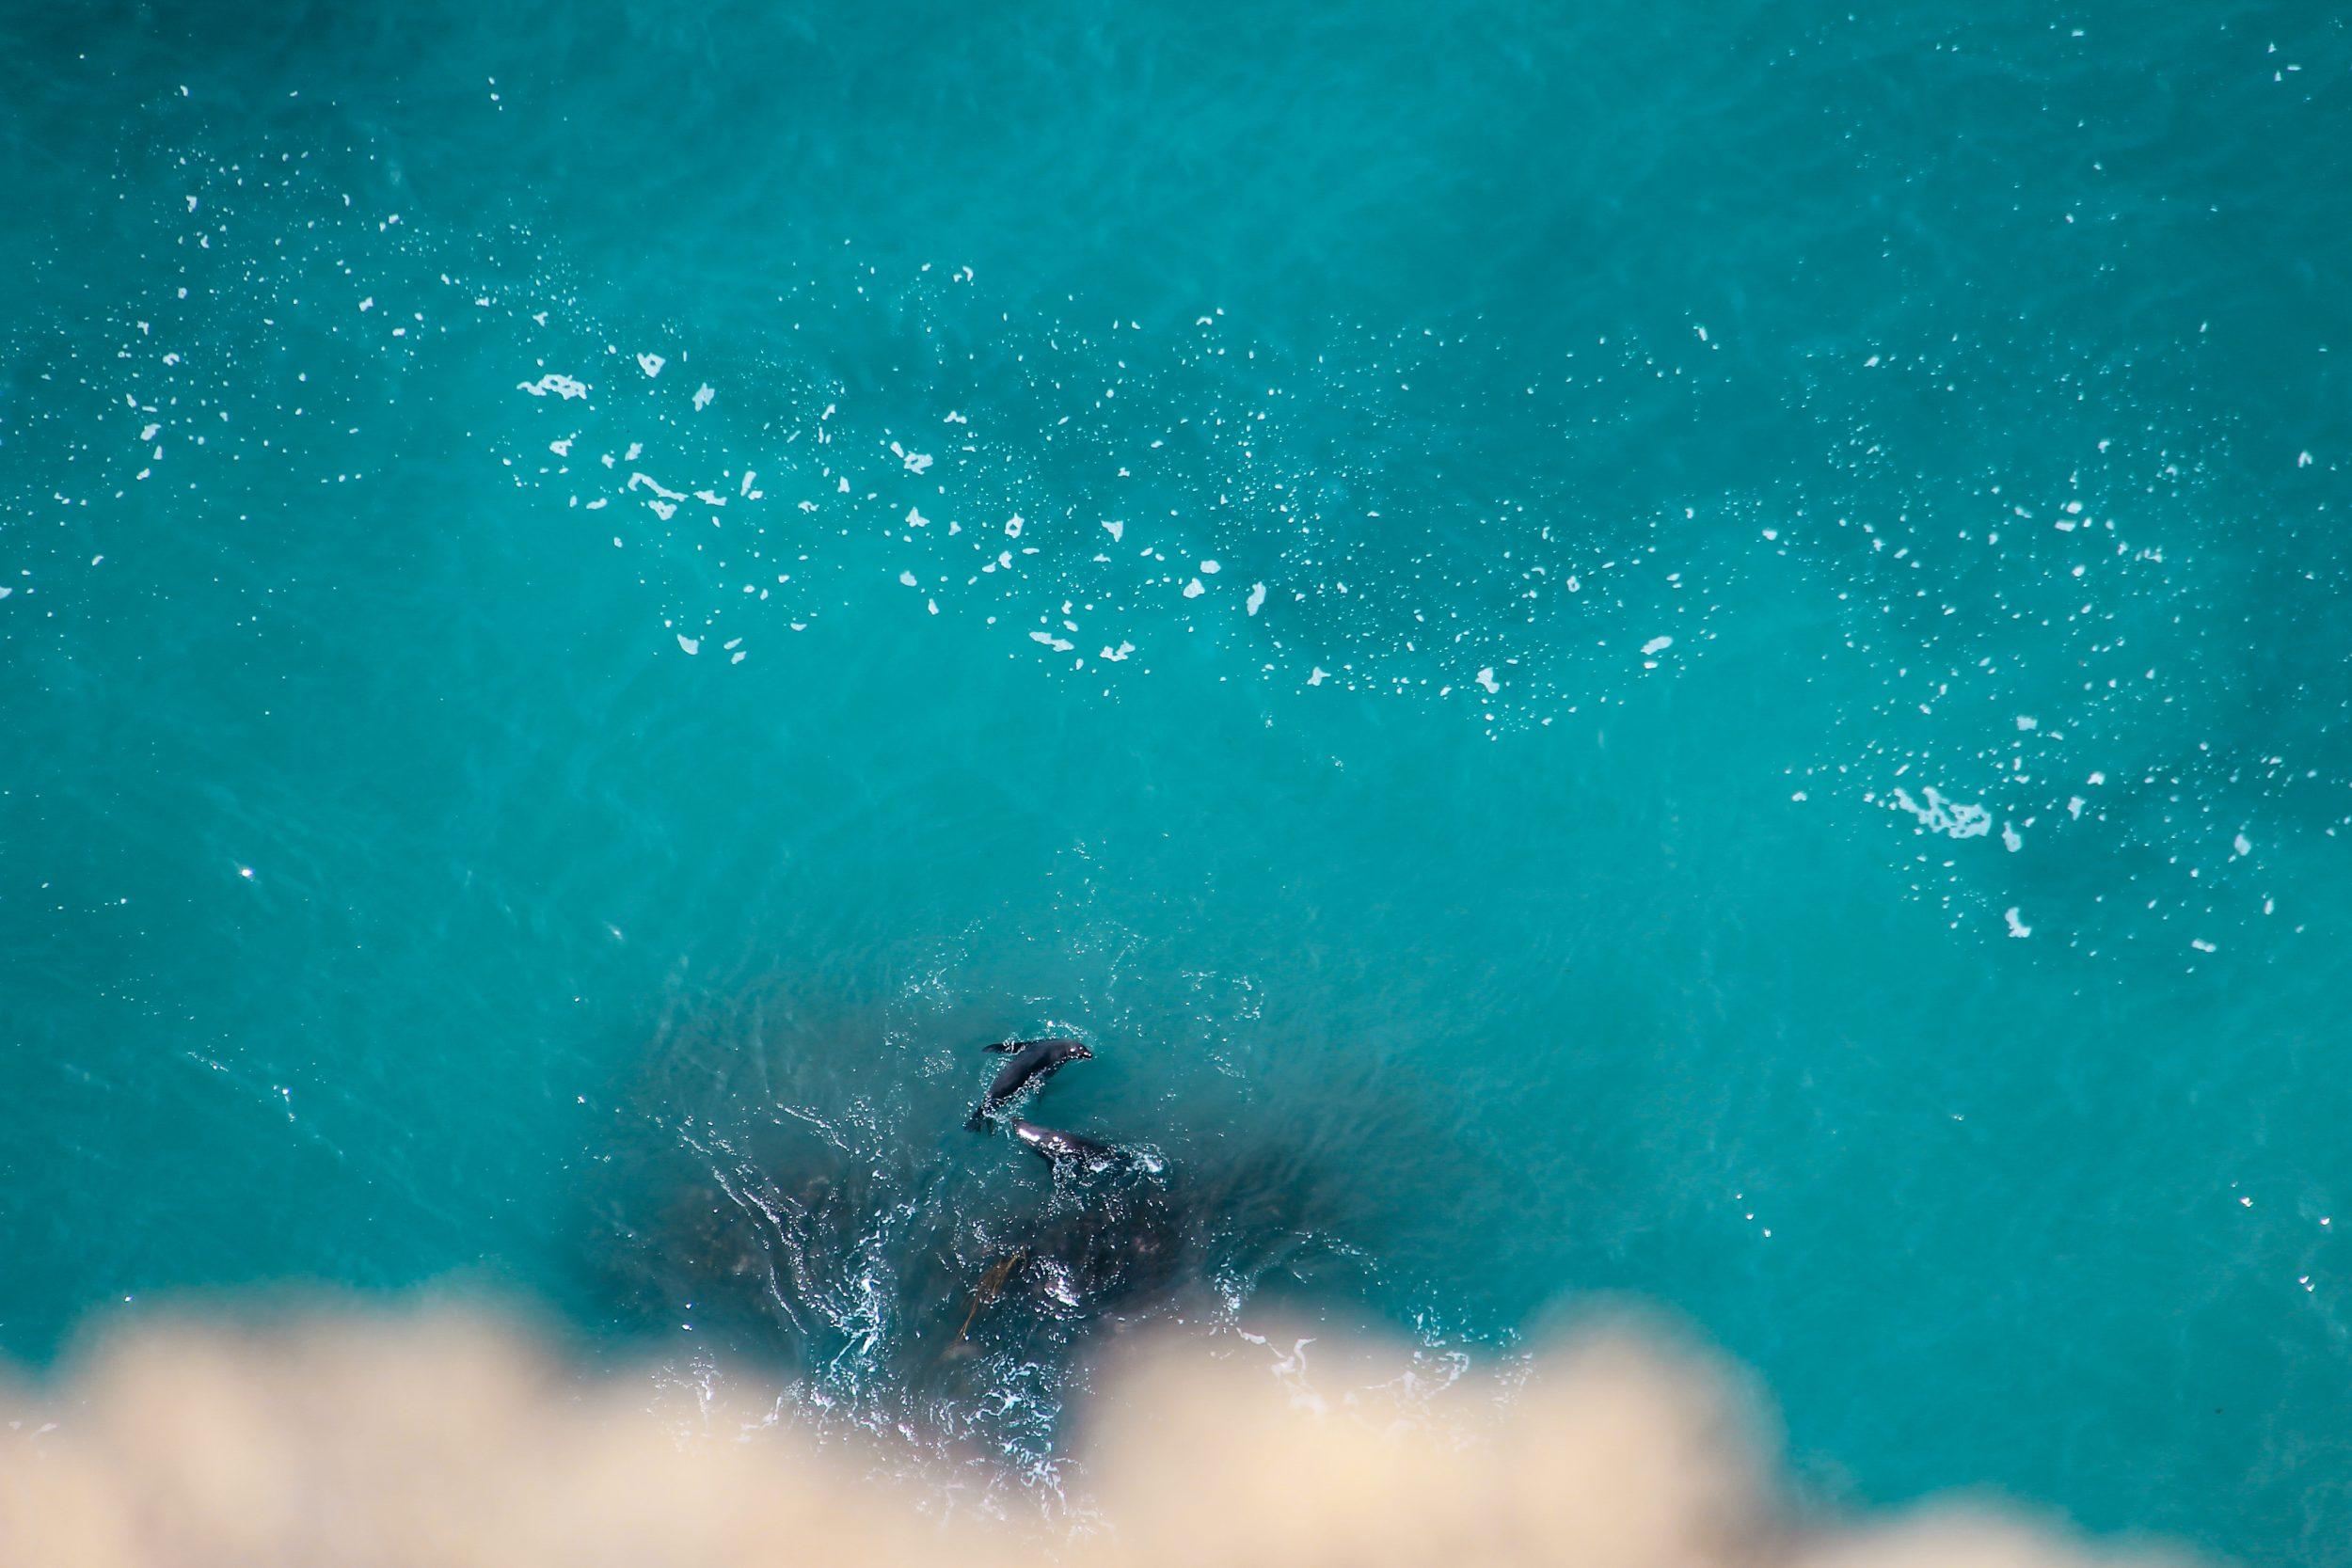 Zeeleeuwen Nieuw ZeelandZeeleeuwen Nieuw Zeeland